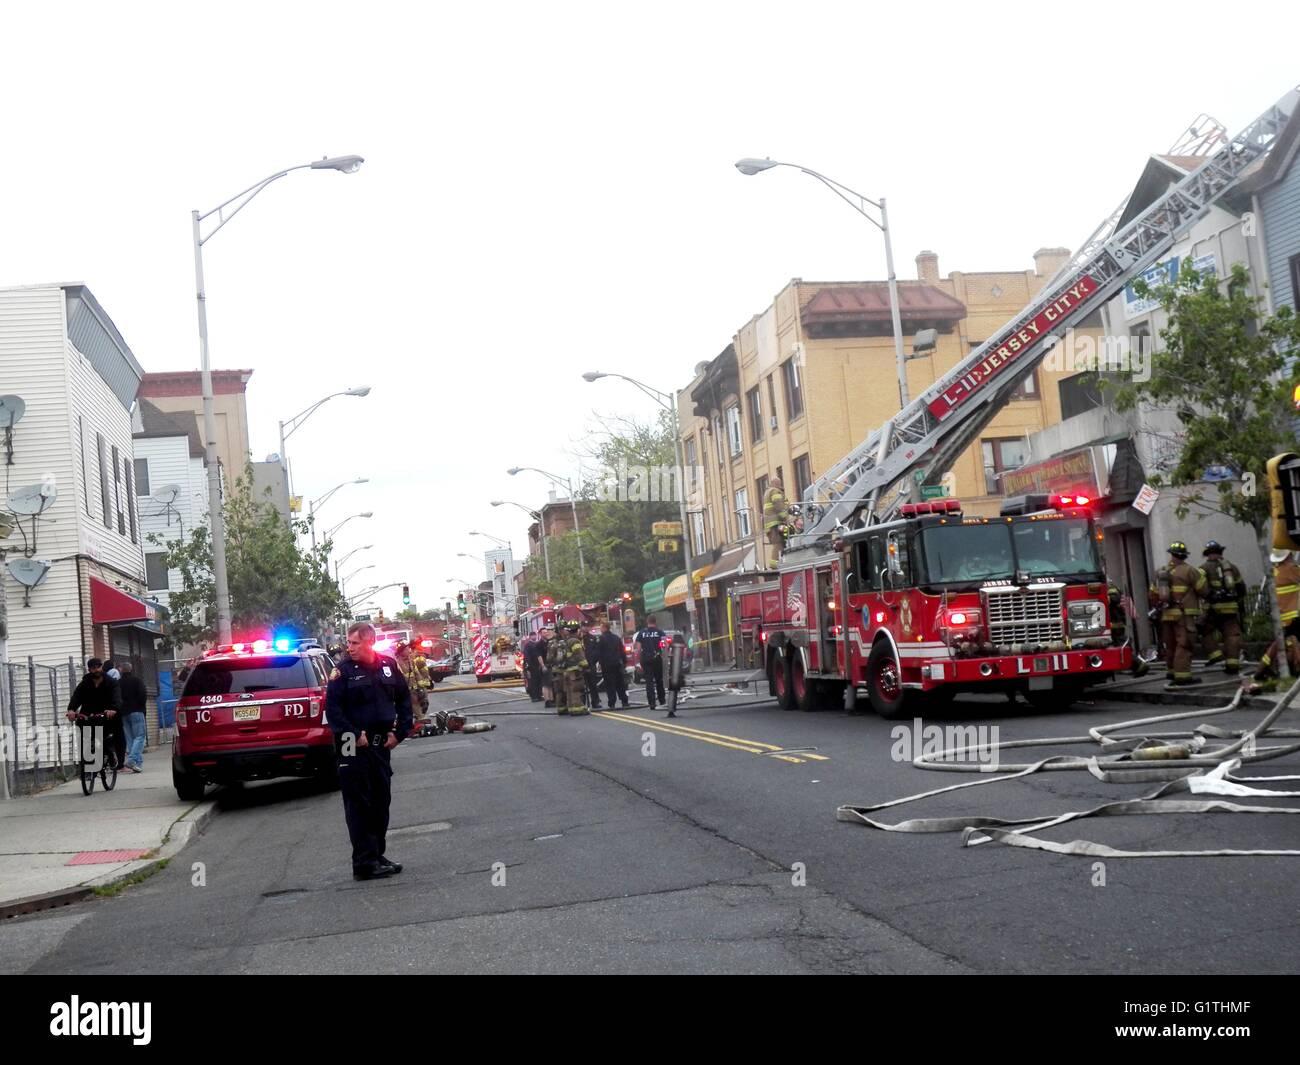 Jersey City  N J  USA  18th May 2016  -3 alarm fire breaks